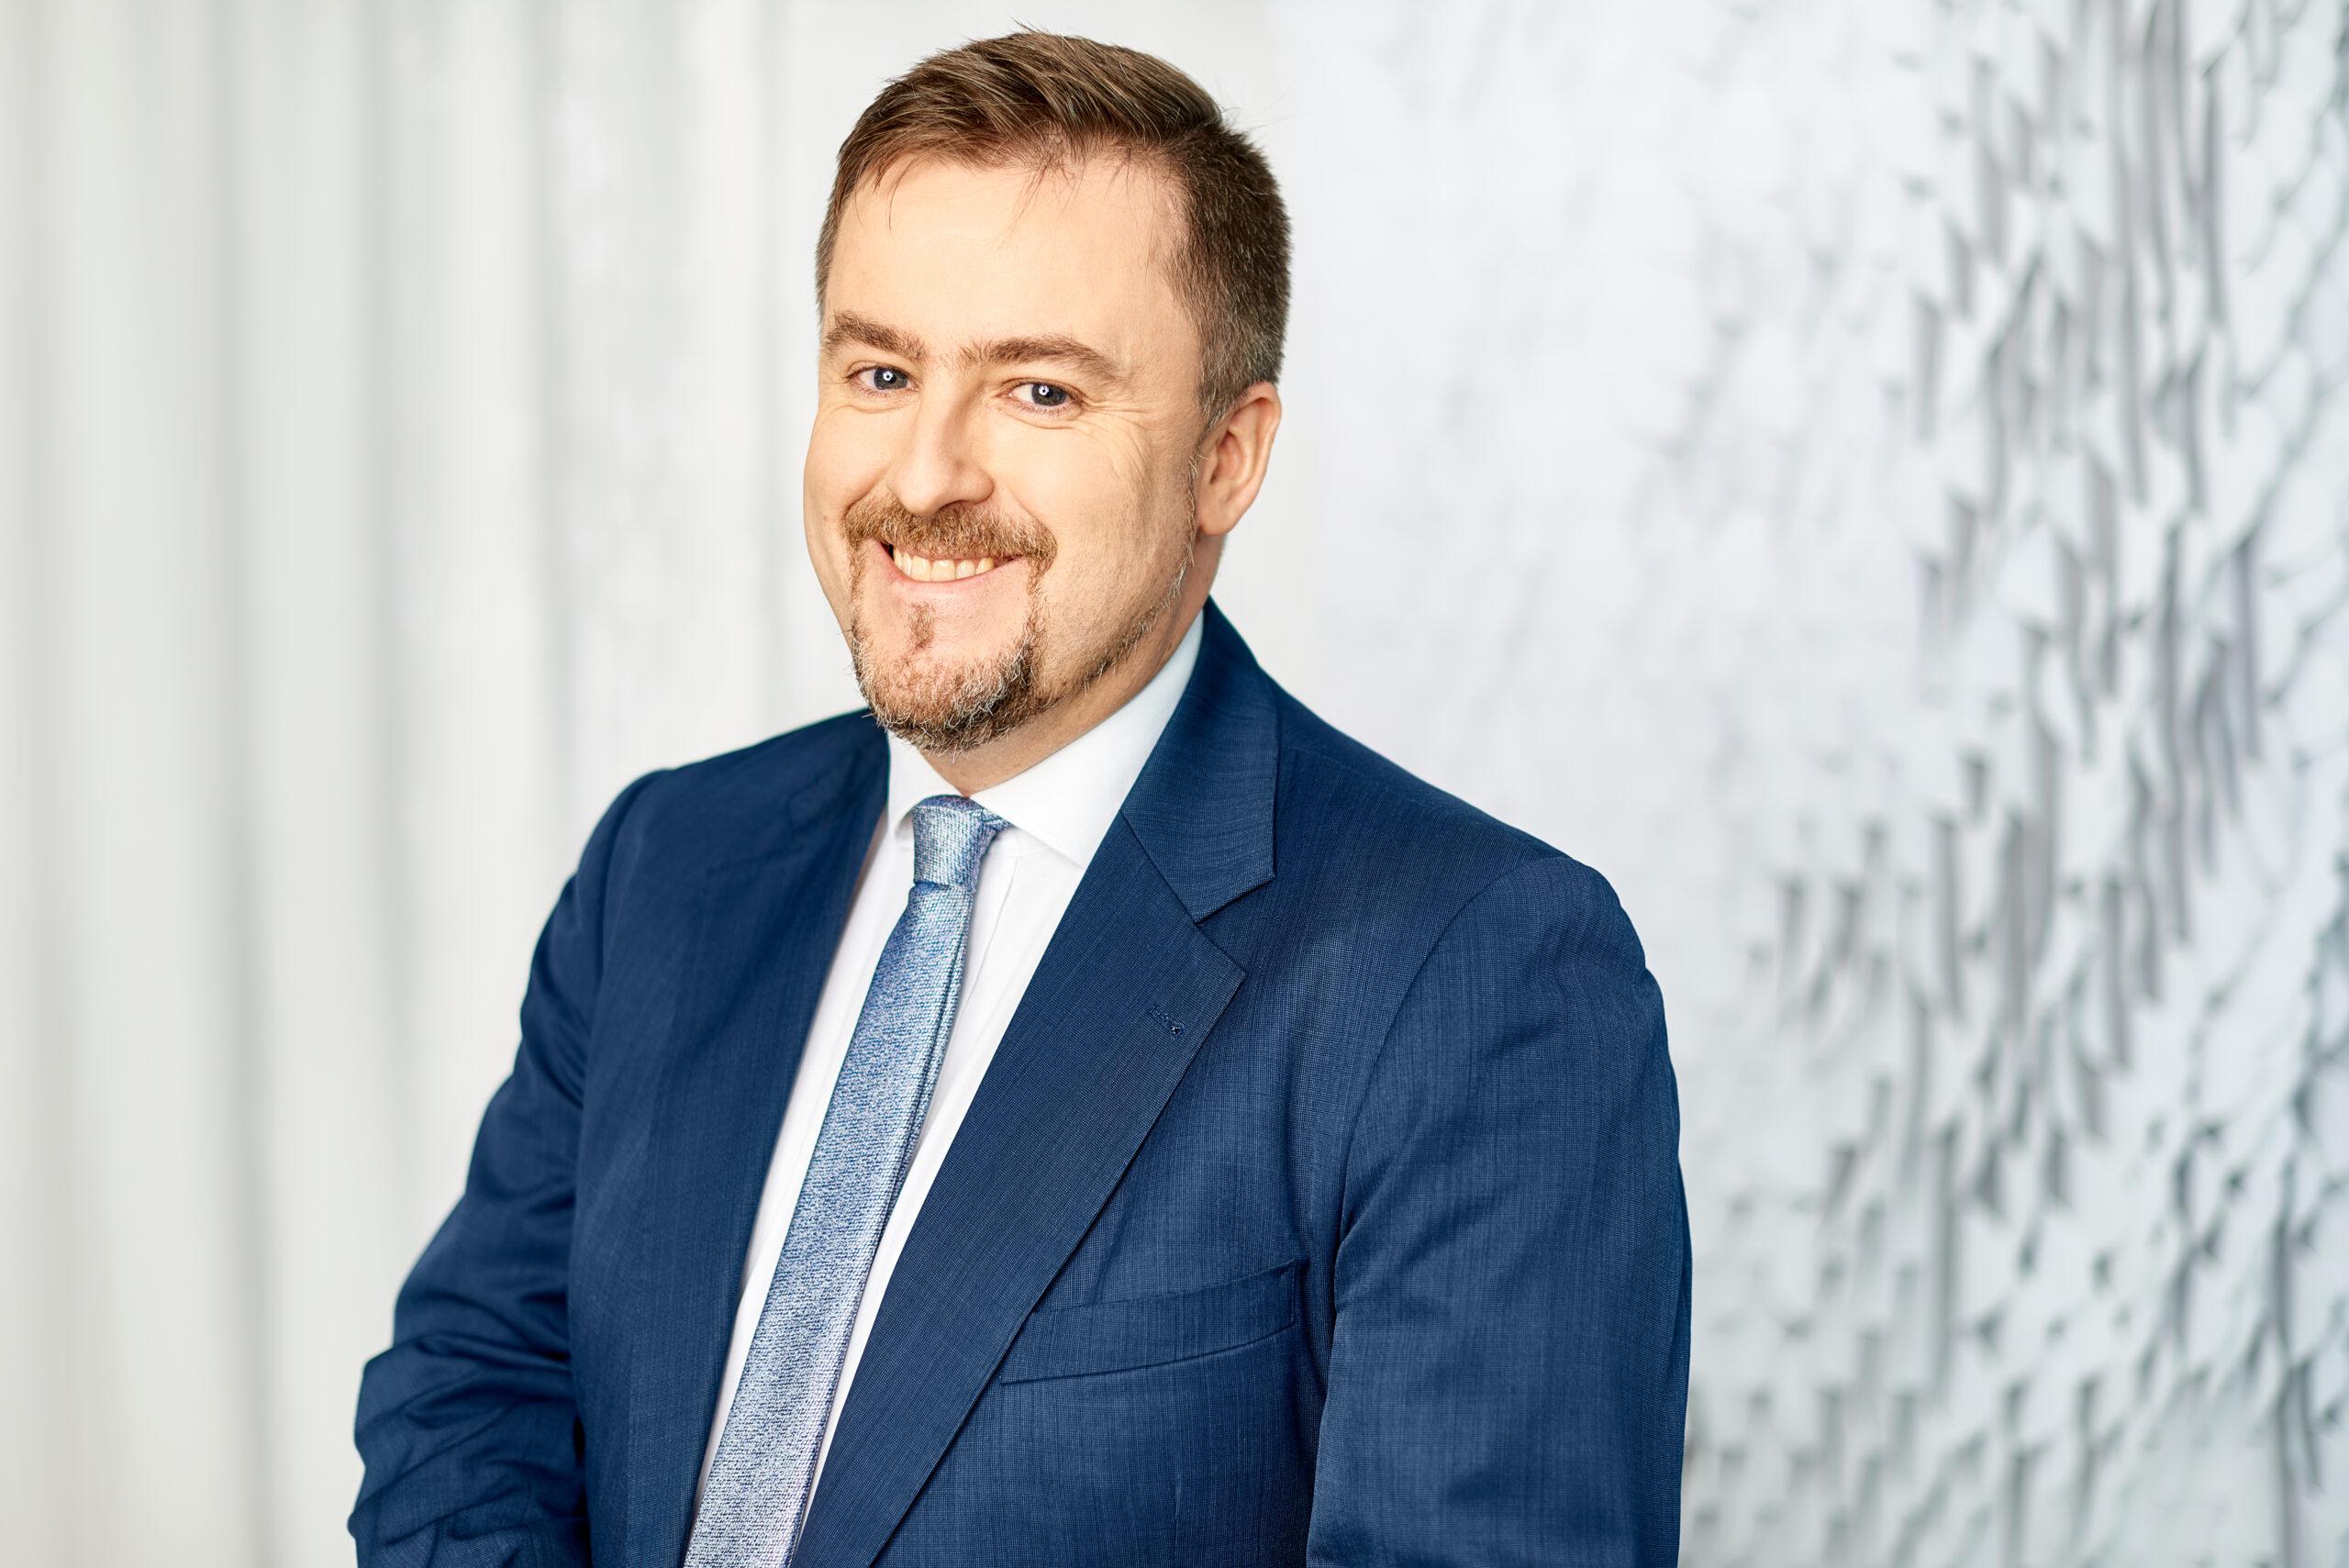 Jakub Sylwestrowicz